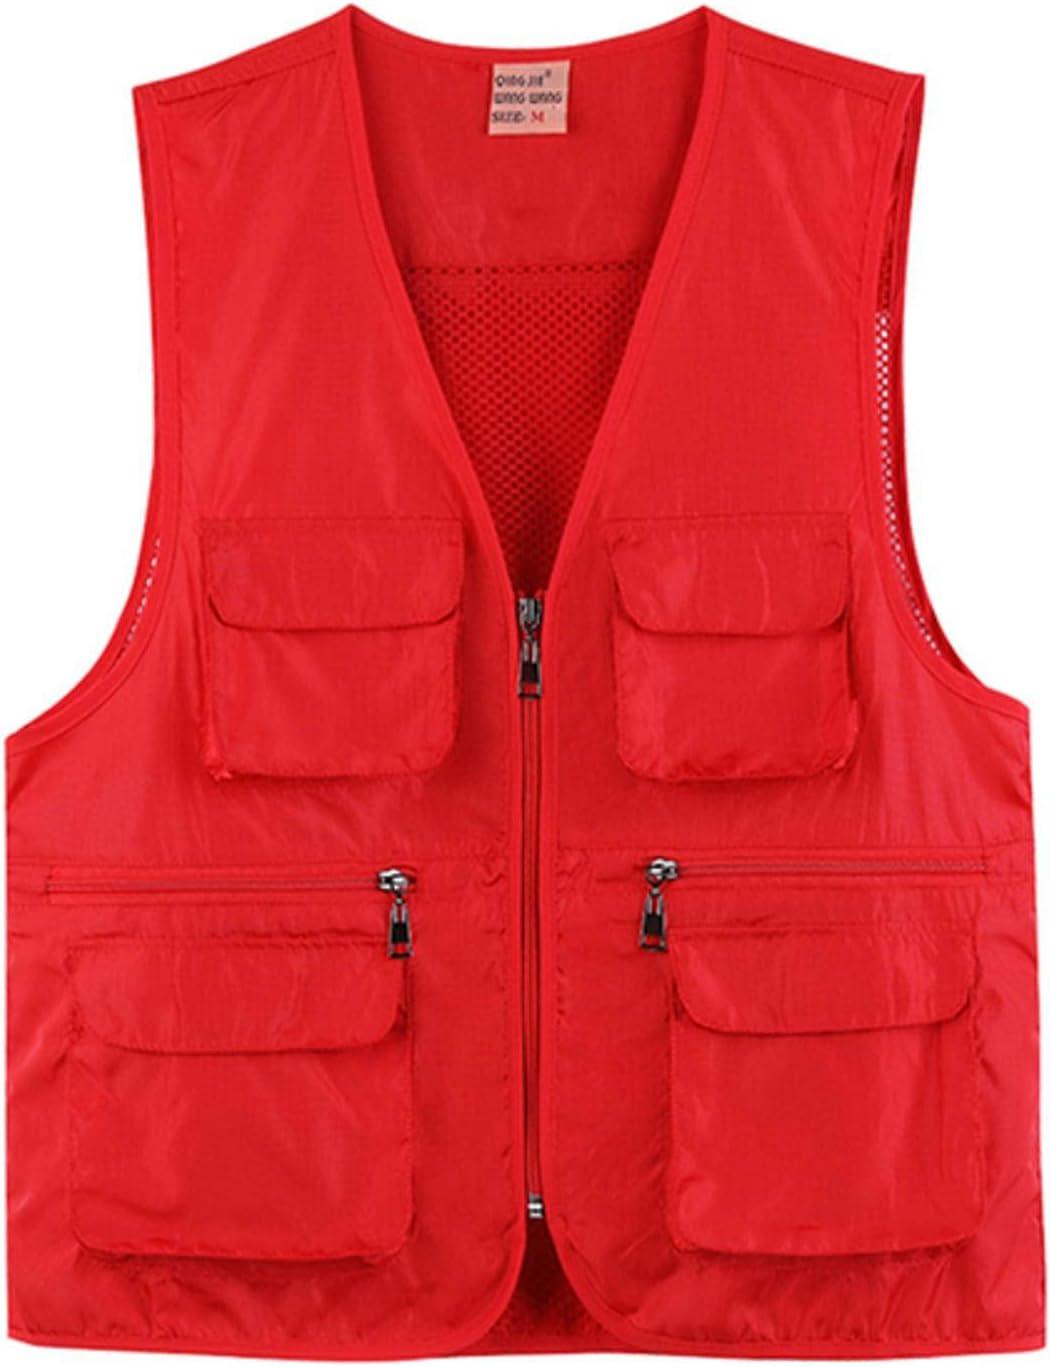 NC Seven-Color Zipper Vest Multi-Pocket Waterproof Mesh Vest Men's Vest Three-Dimensional Pocket Jacket Q865